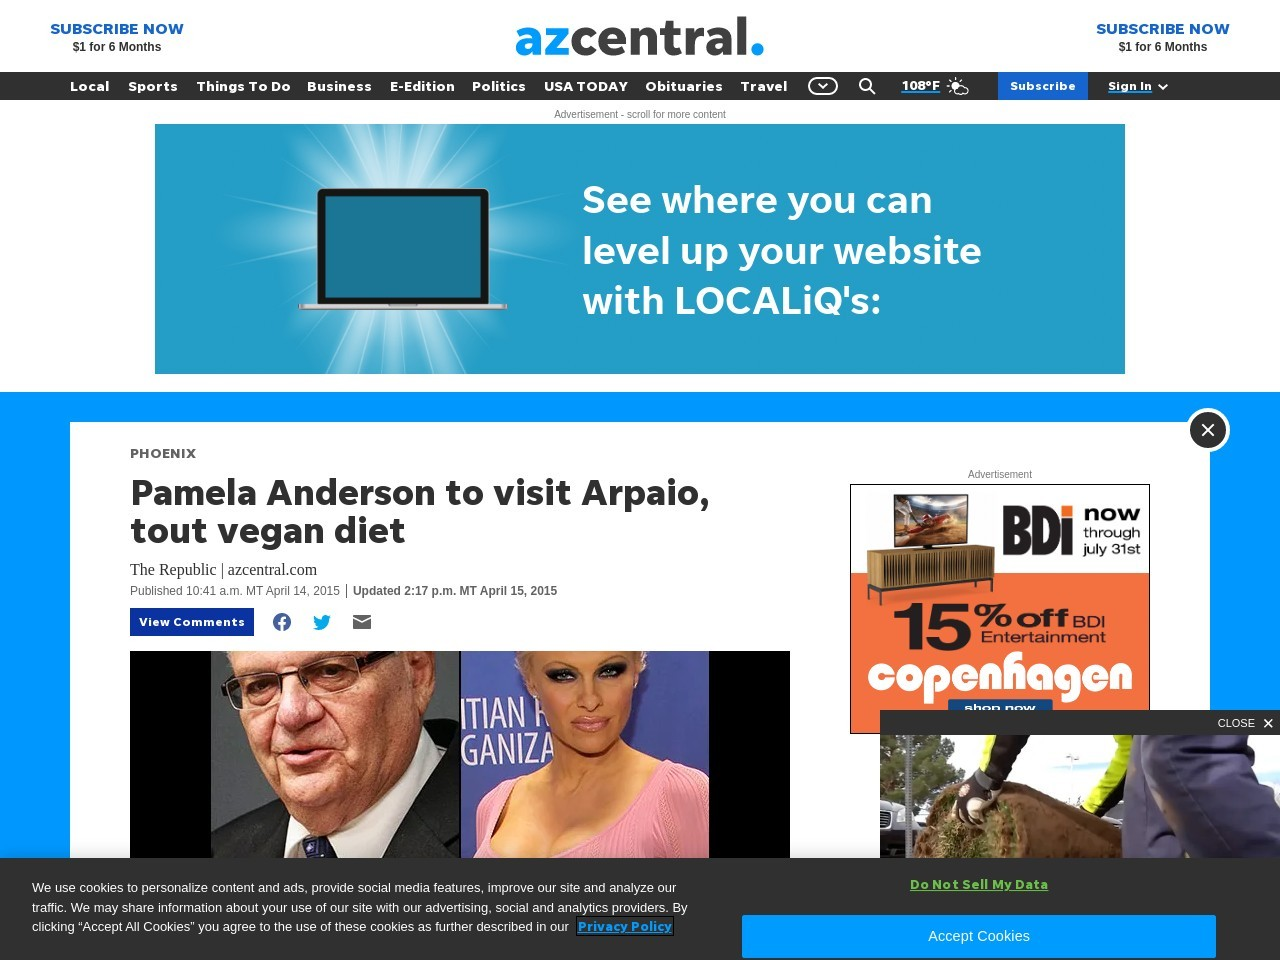 Pamela Anderson to visit Arpaio, tout vegan diet